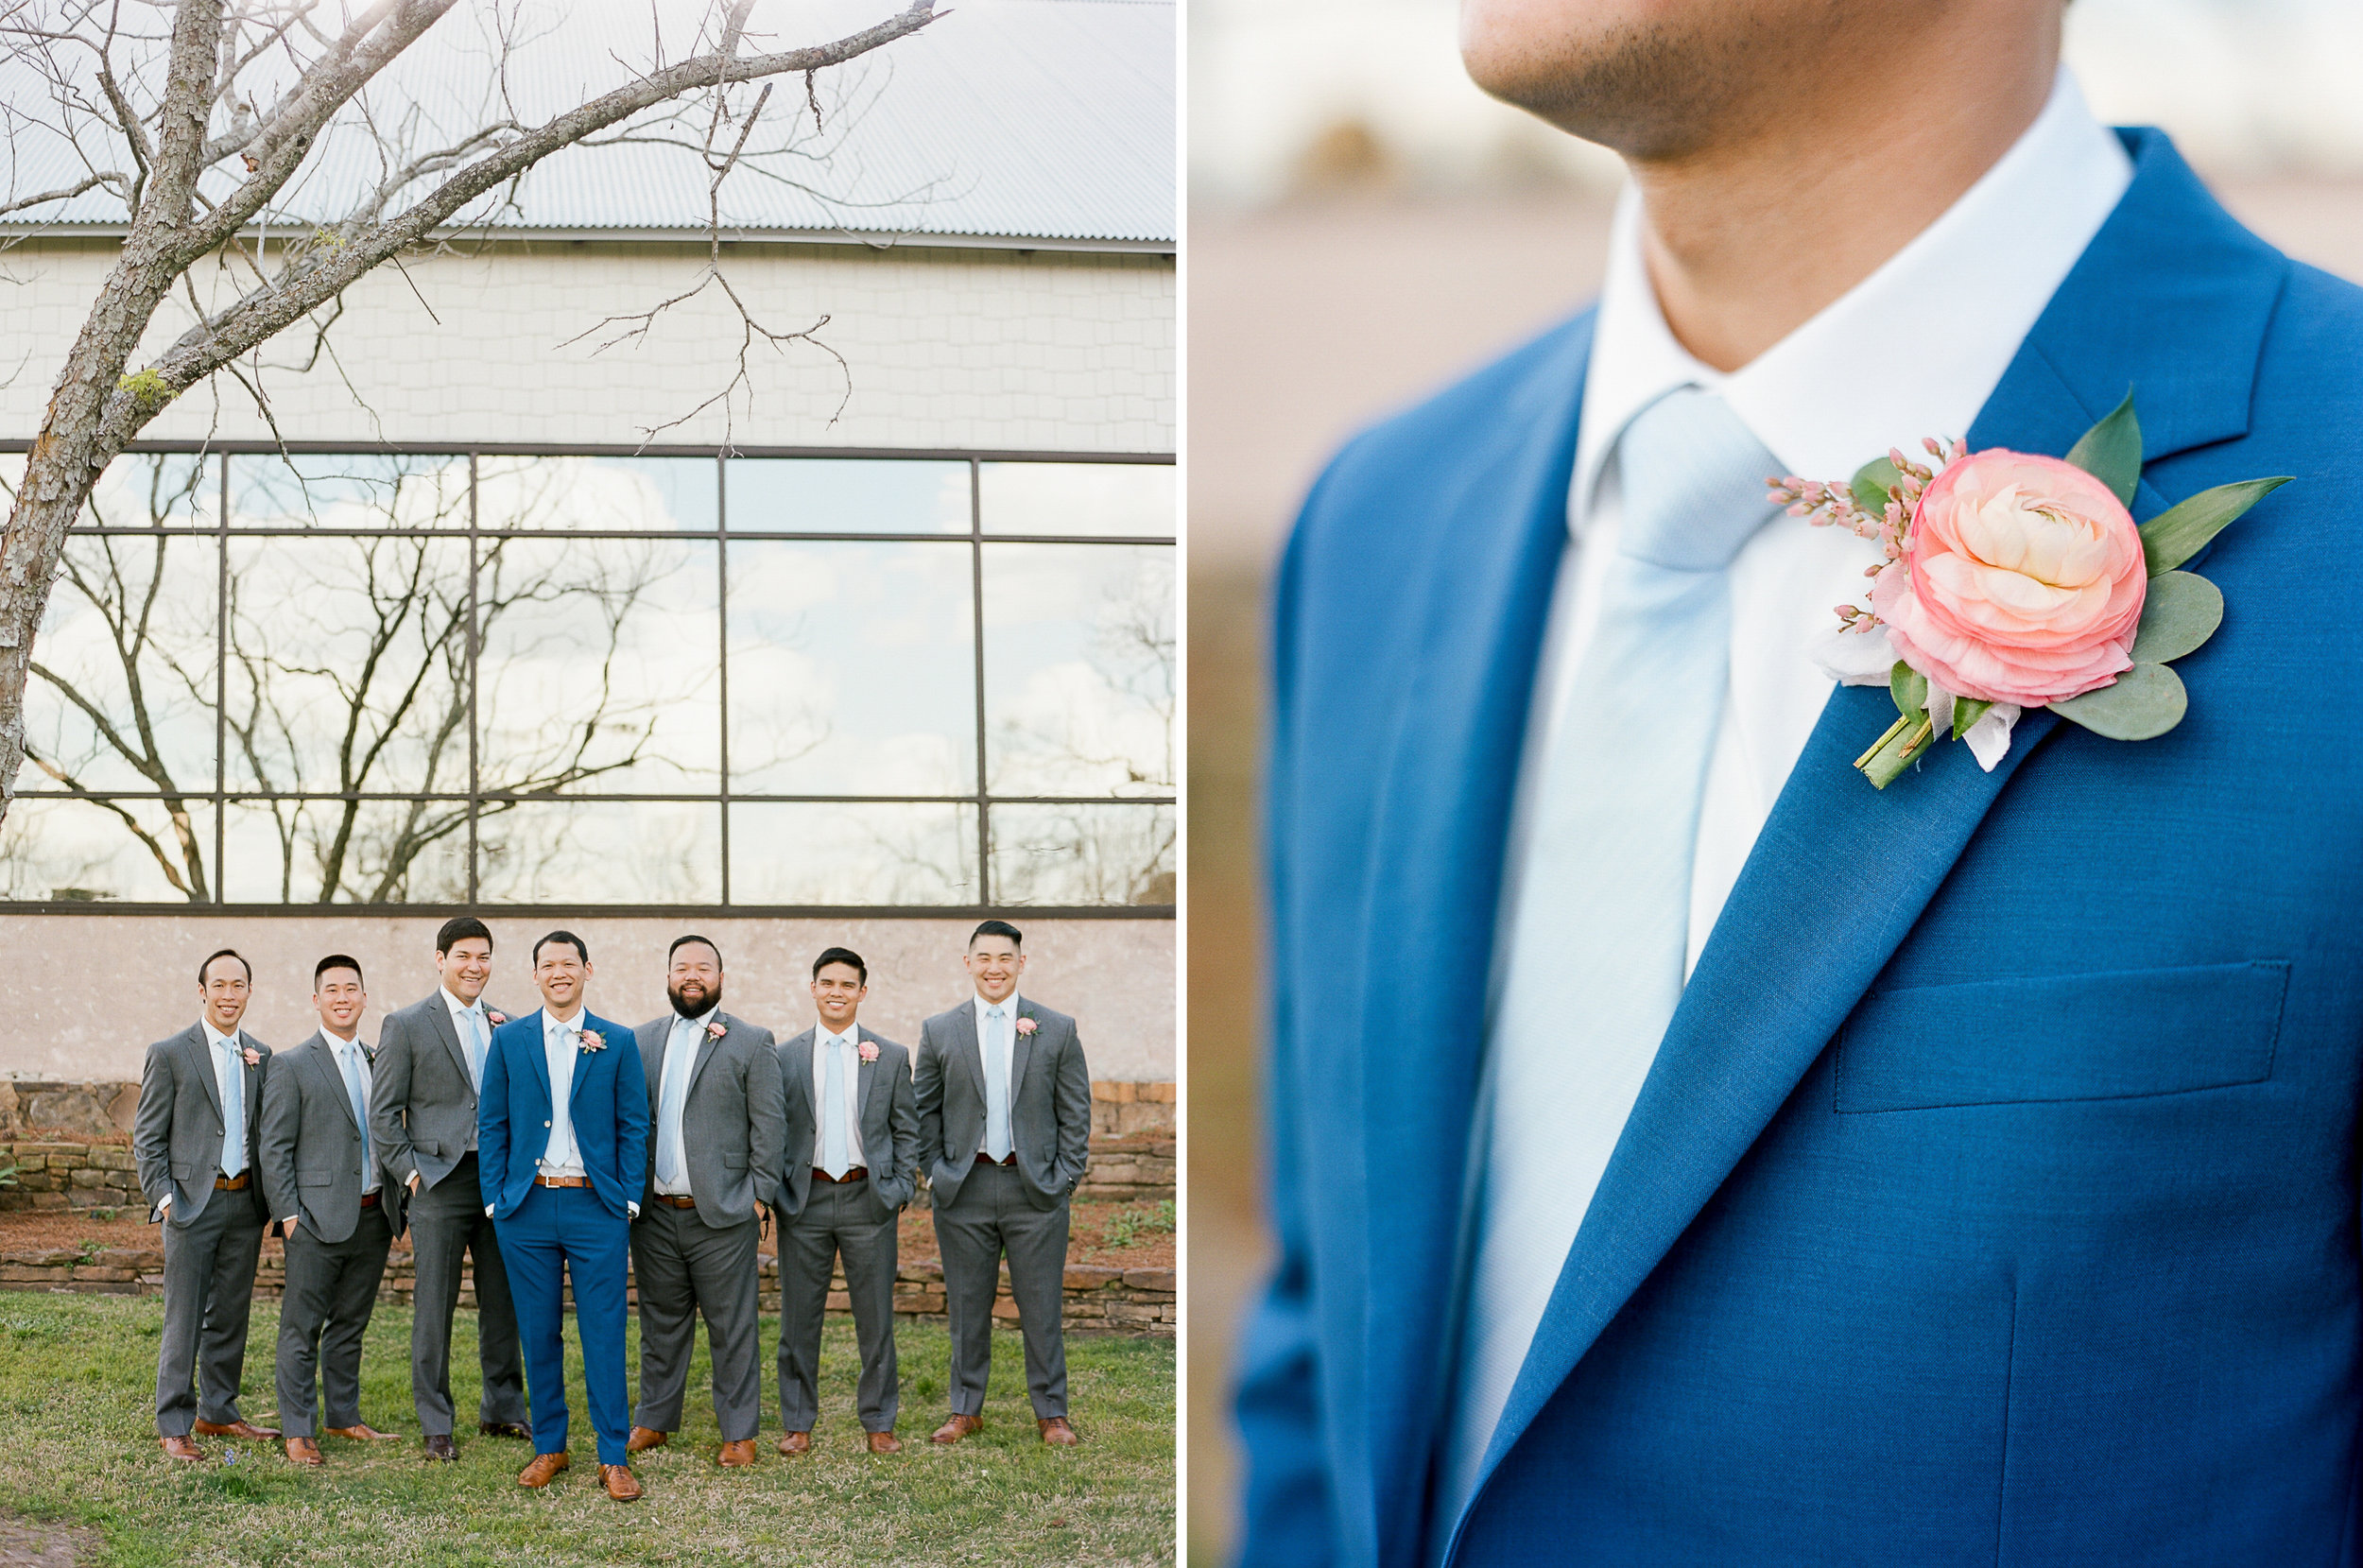 The-Knot-50-Weddings-50-States-Texas-Winner-Dana-Fernandez-photography-houston-wedding-photographer-film-fine-art-destination-113.jpg